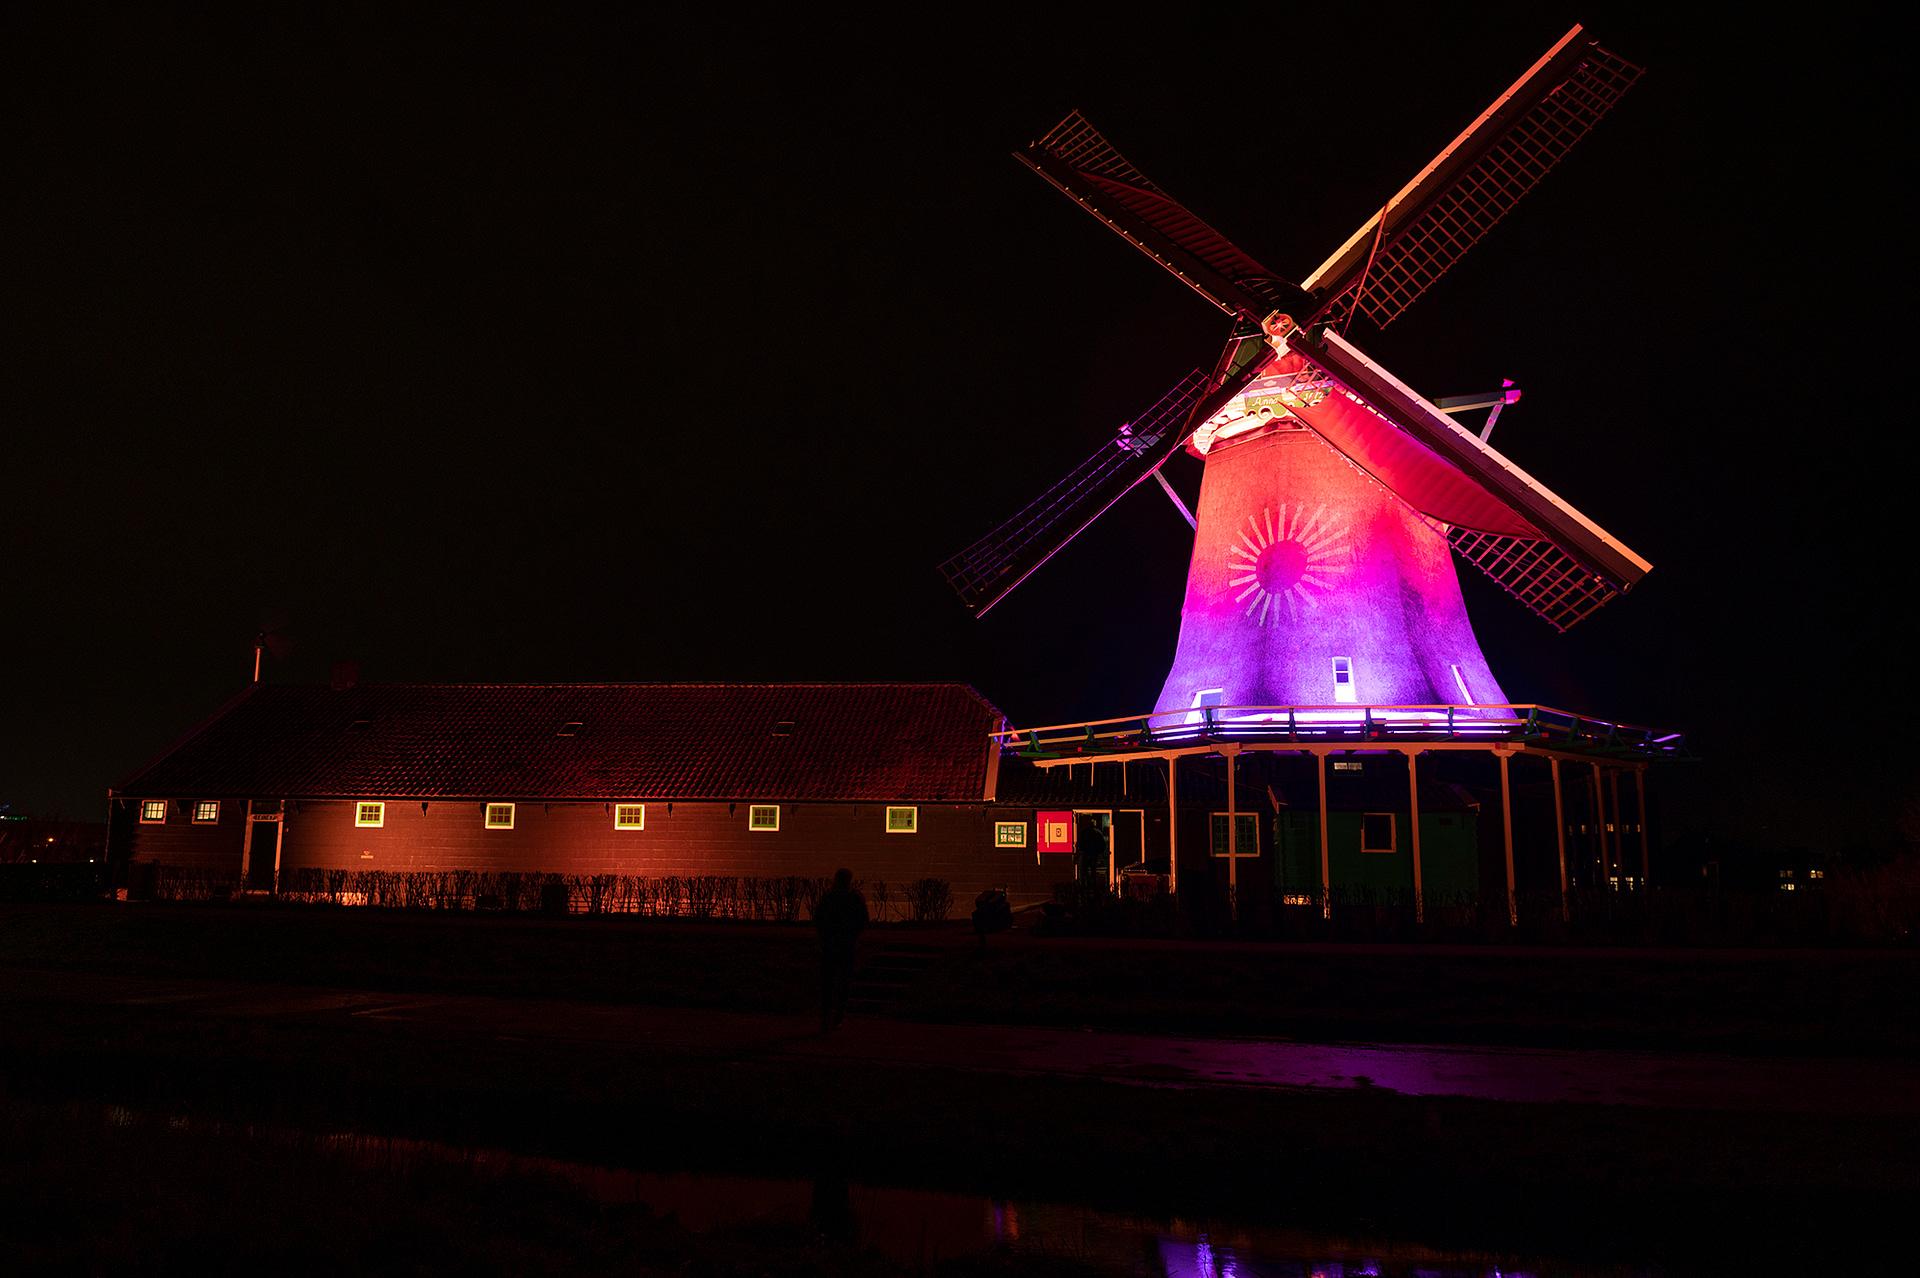 Old Mill de Zoeker, Zaanstad, Netherlands by Ron Koffeman